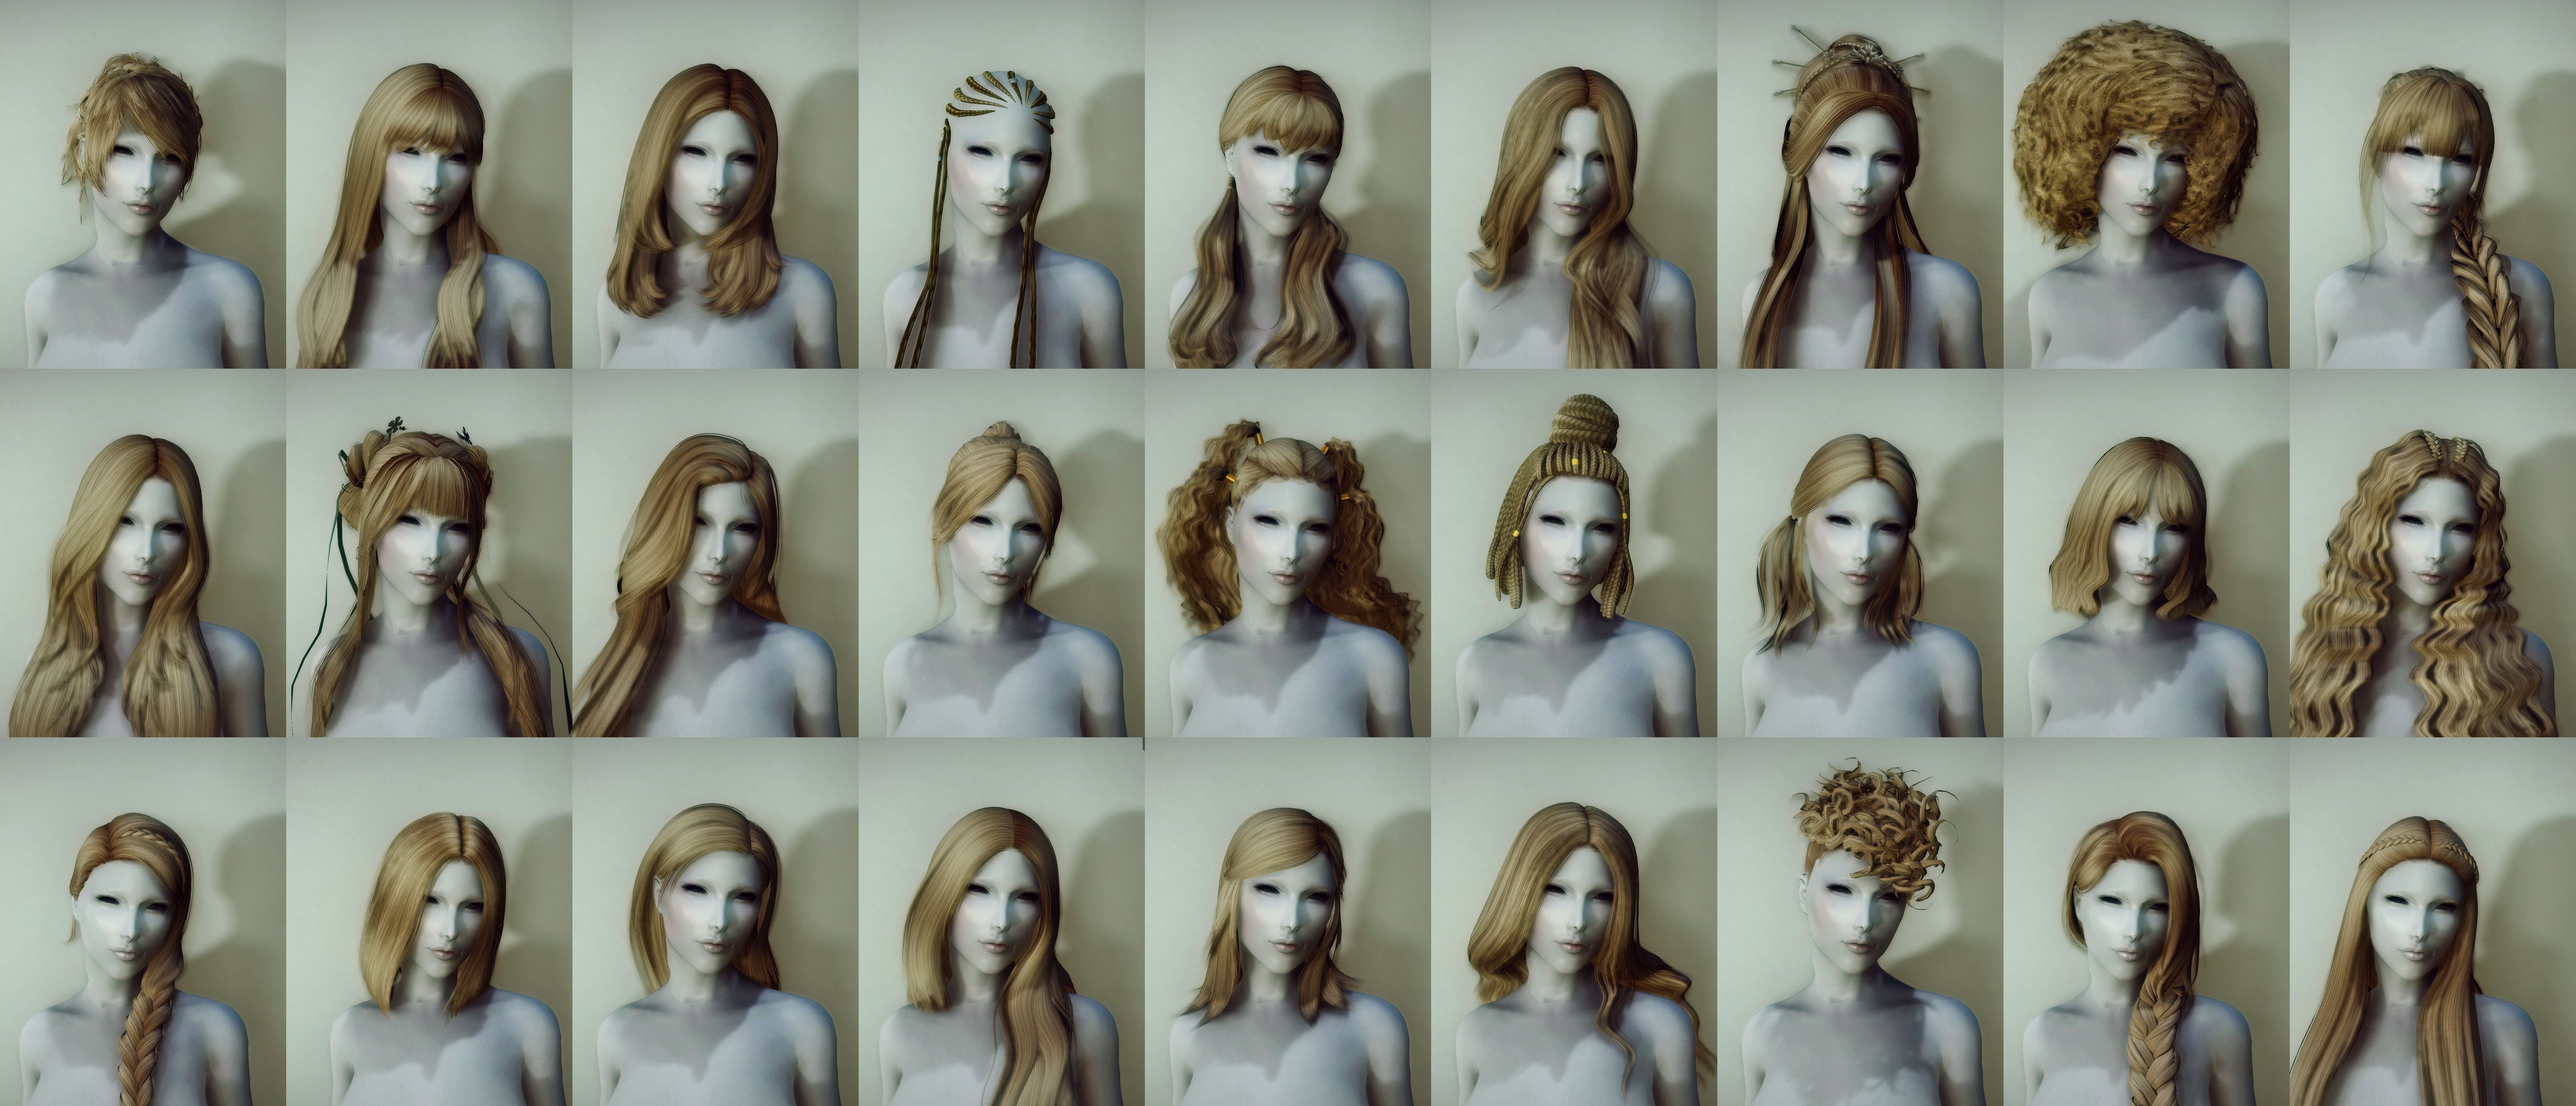 Holiday Hairdos - Downloads - Skyrim Non Adult Mods - LoversLab